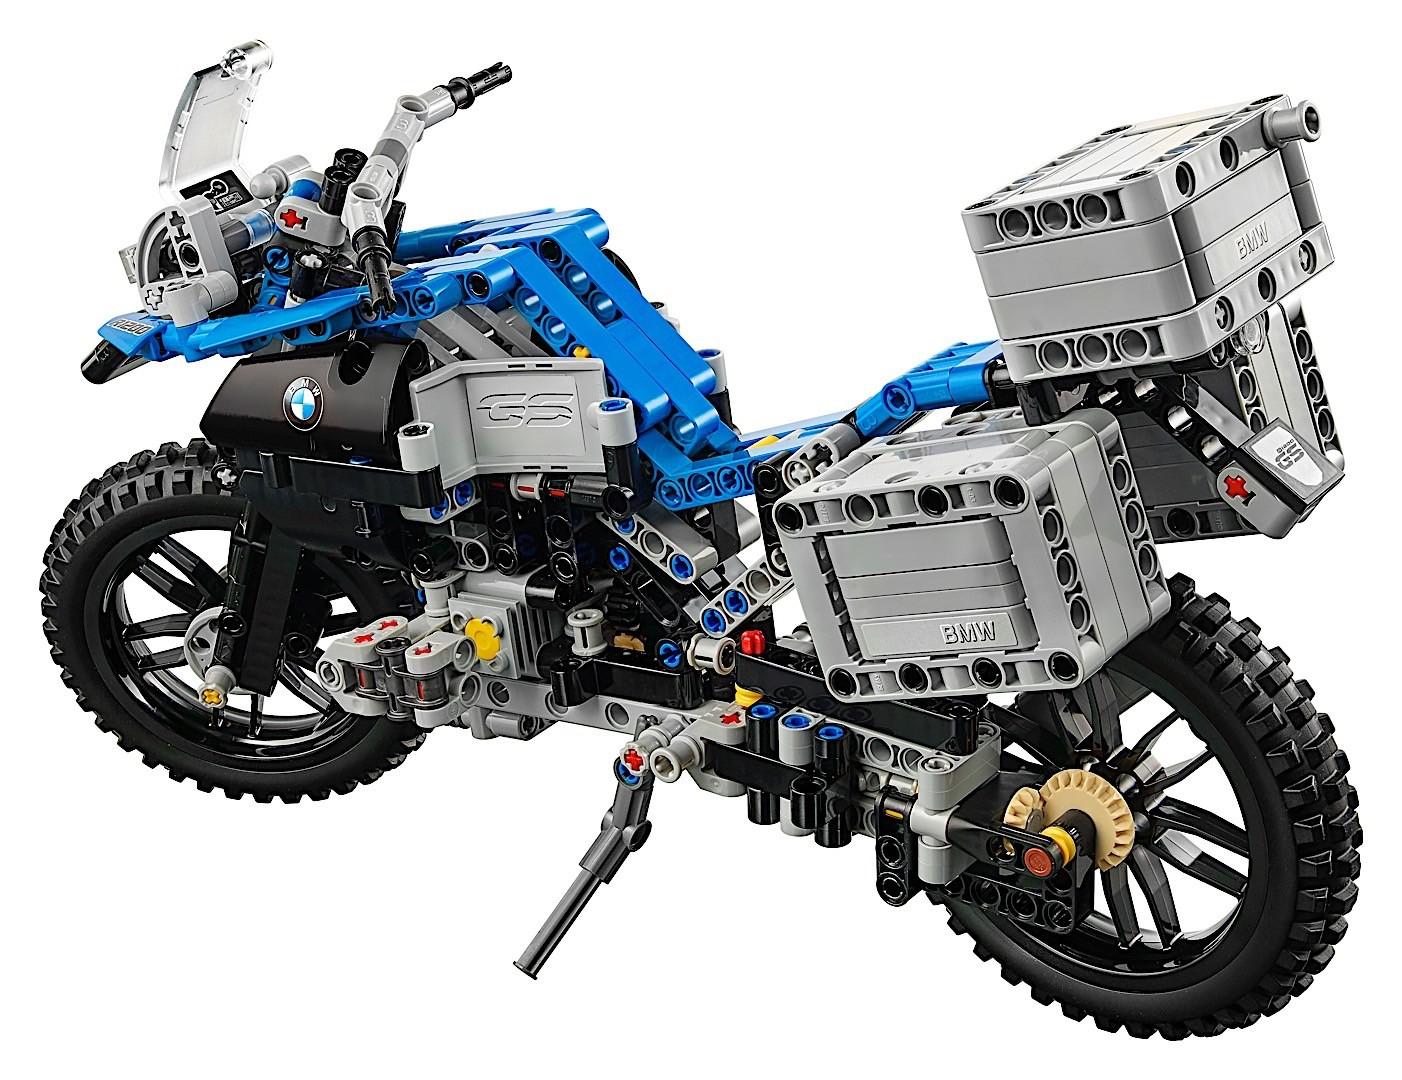 Lego Bmw R 1200 Gs Adventure On Shelves Starting 2017